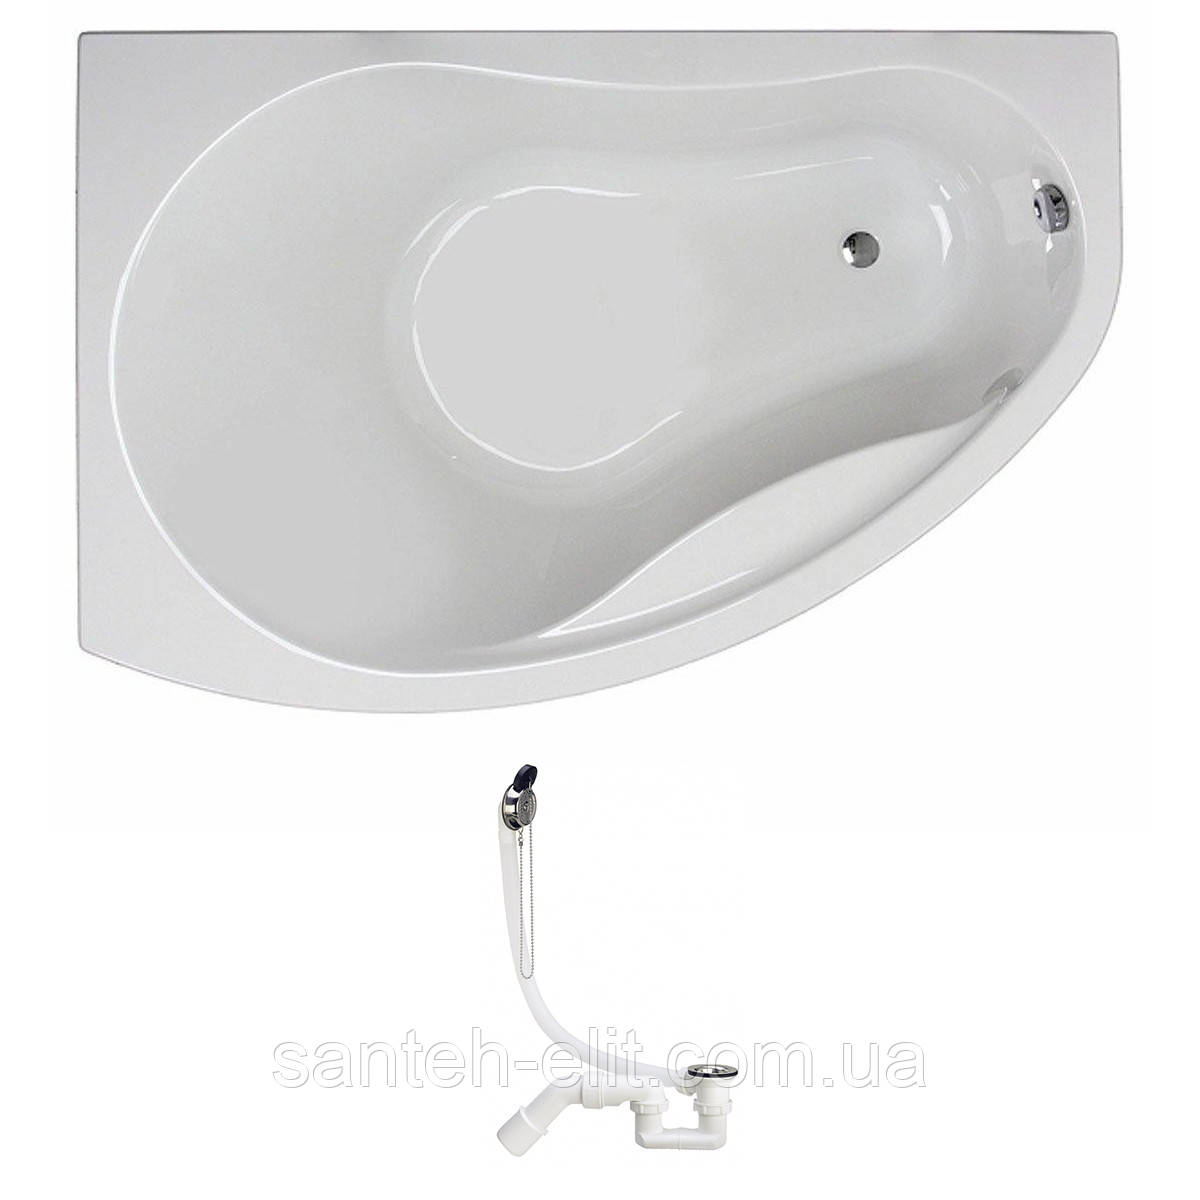 Ванна Kolo PROMISE 150*100см асимметричная, левая, белая, с ножками SN7 + Viega Simplex сифон для ванны